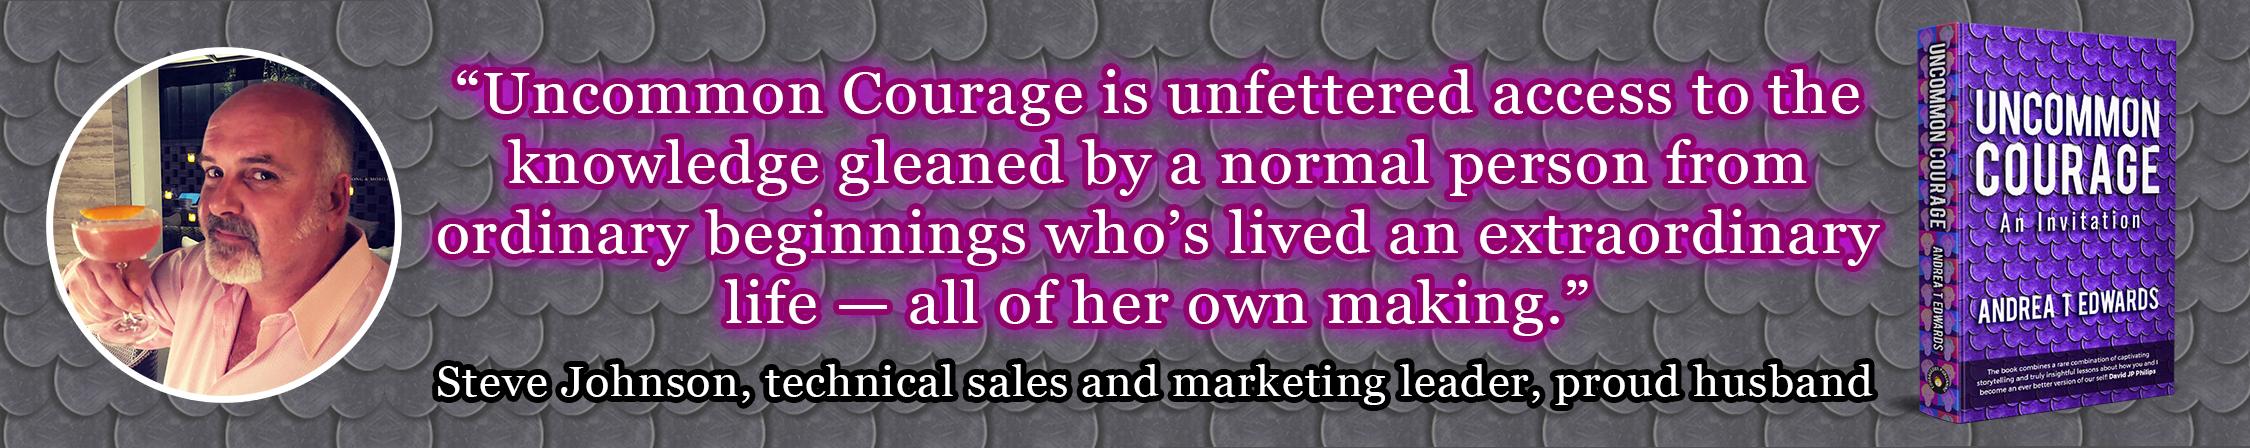 Steve - Uncommon Courage Andrea T Edwards